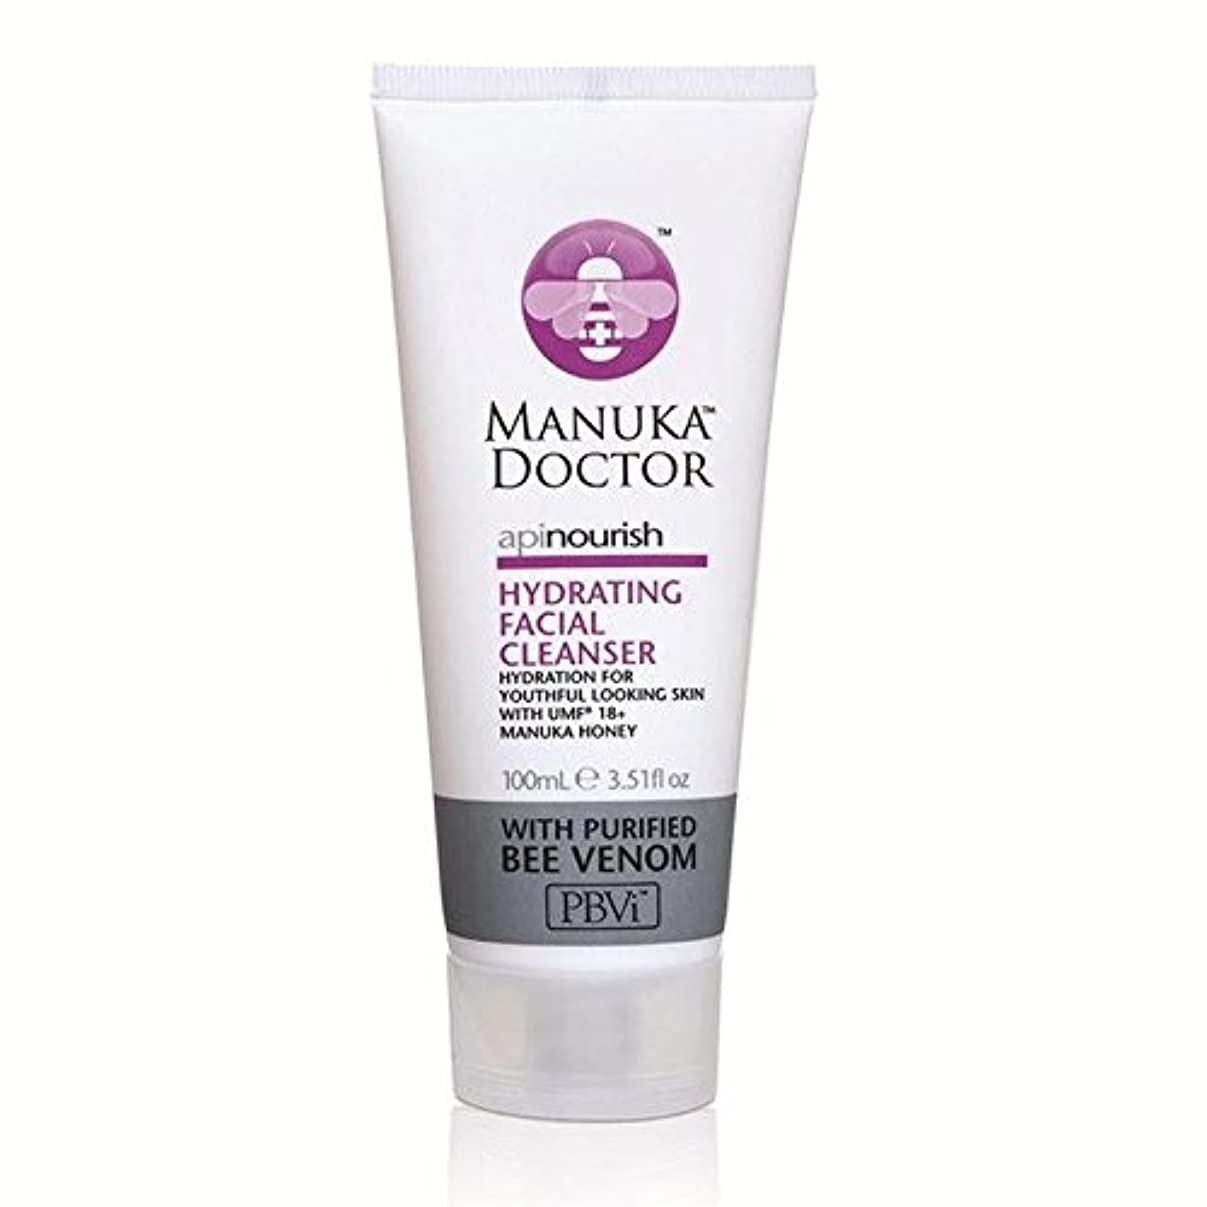 Manuka Doctor Api Nourish Hydrating Facial Cleanser 100ml - マヌカドクター洗顔料の100ミリリットルの水和養います [並行輸入品]